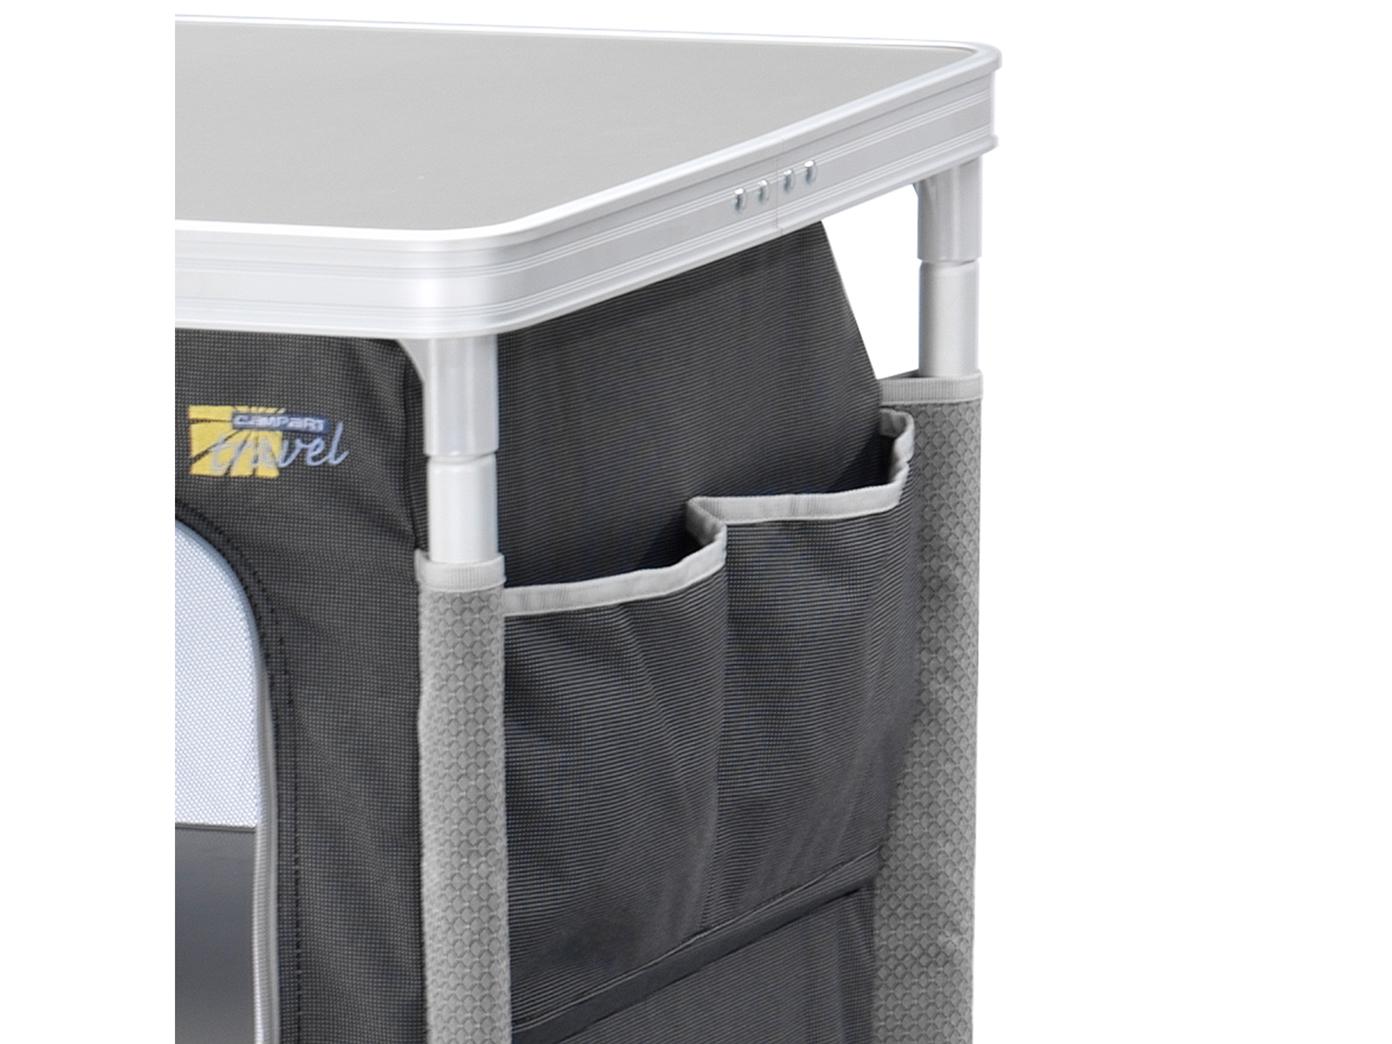 design campingschrank f r outdoor k che faltbar 3 f cher. Black Bedroom Furniture Sets. Home Design Ideas